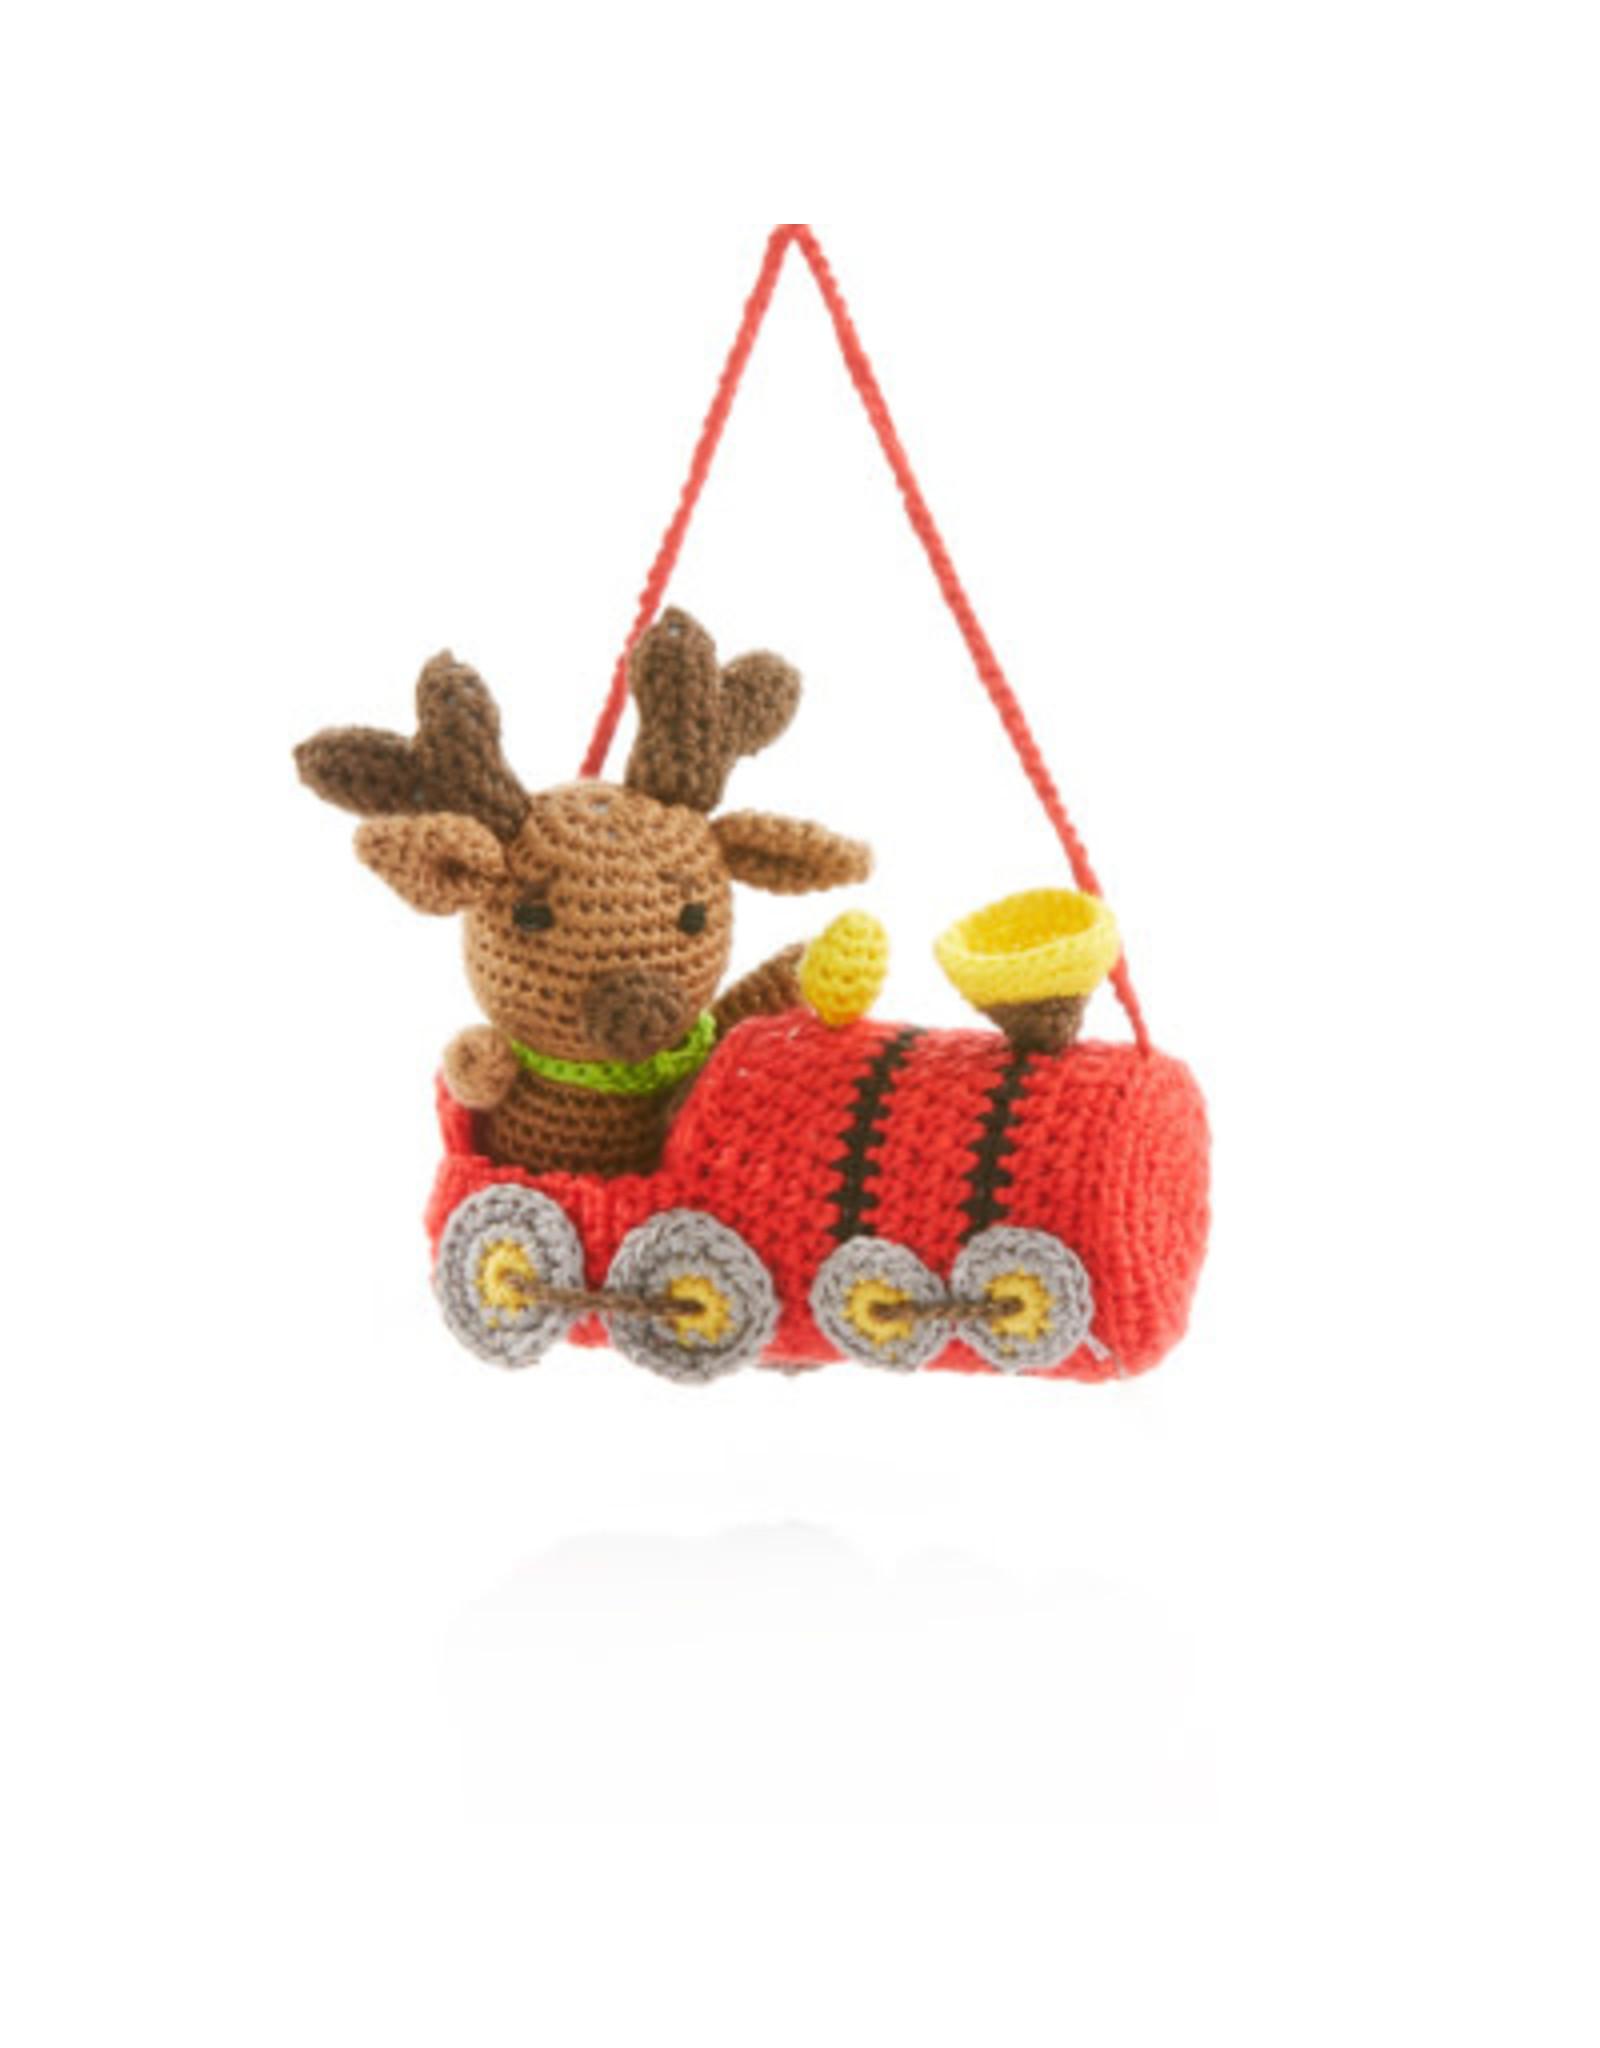 Conductor Moose Crocheted Ornament, Vietnam